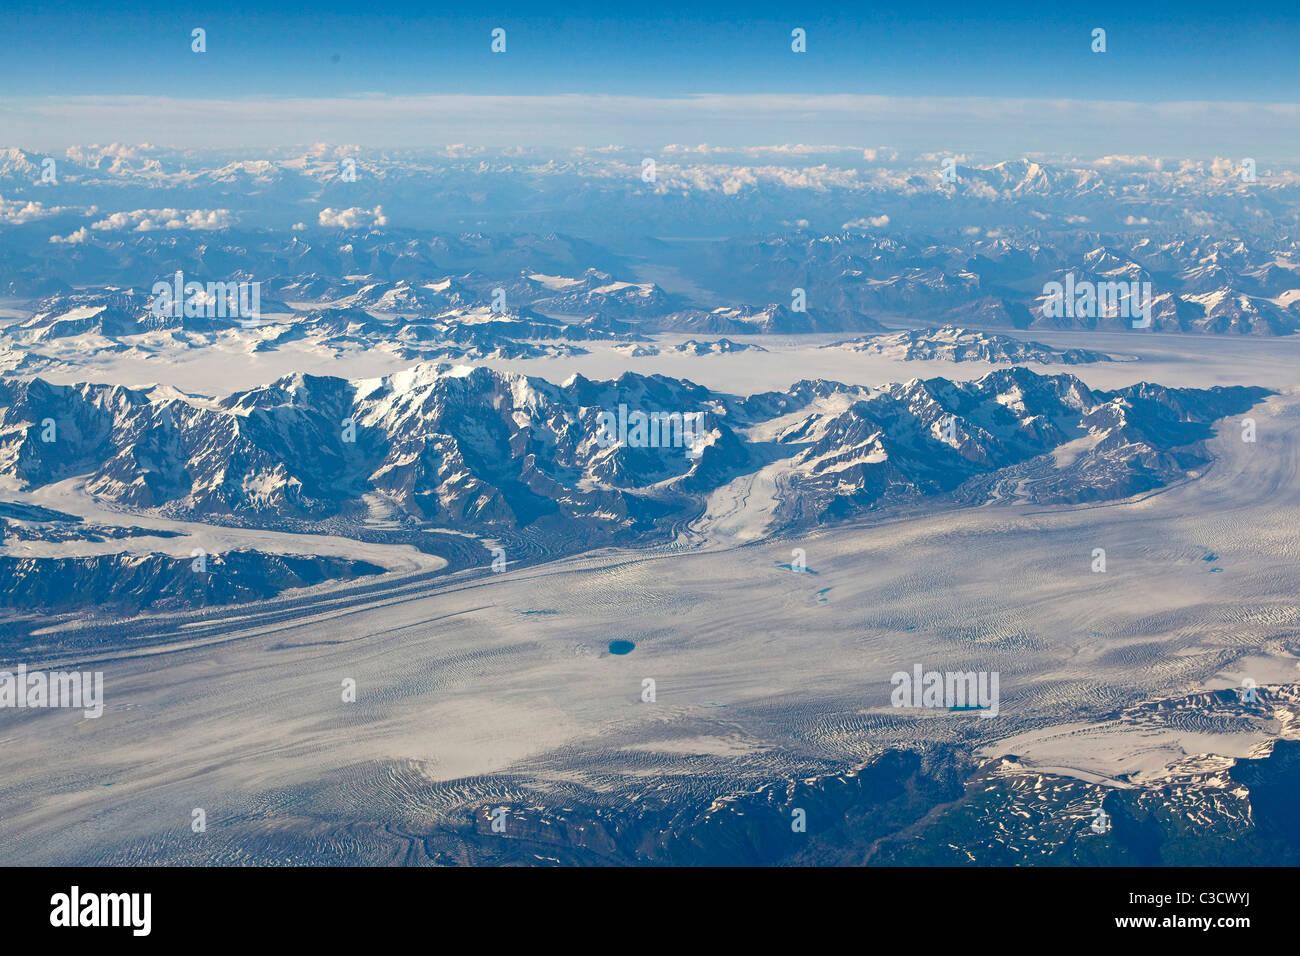 Glacier Bay National Park seen from the air. Alaska, USA. - Stock Image